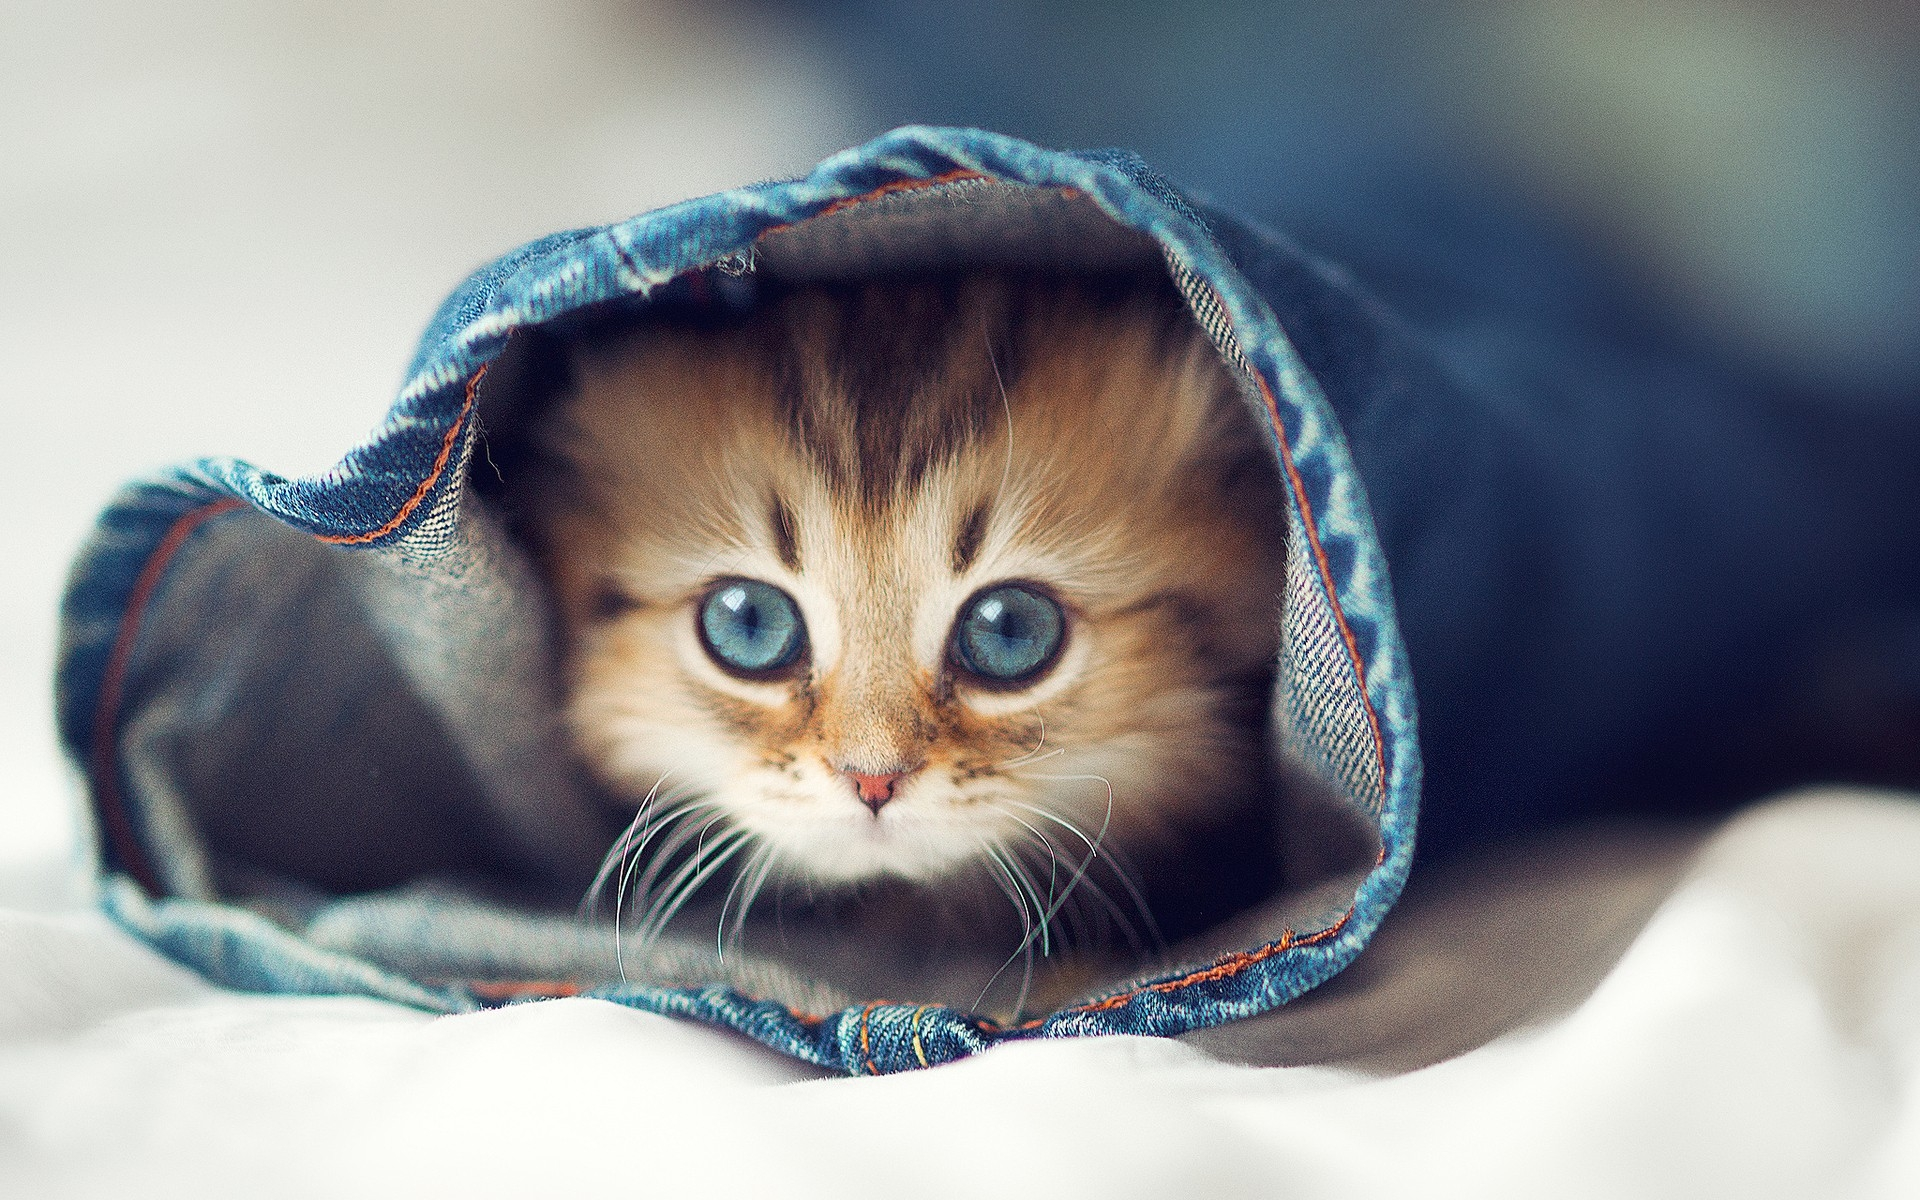 Jeans_cats_animals_kittens_pets_1920x1200.jpg